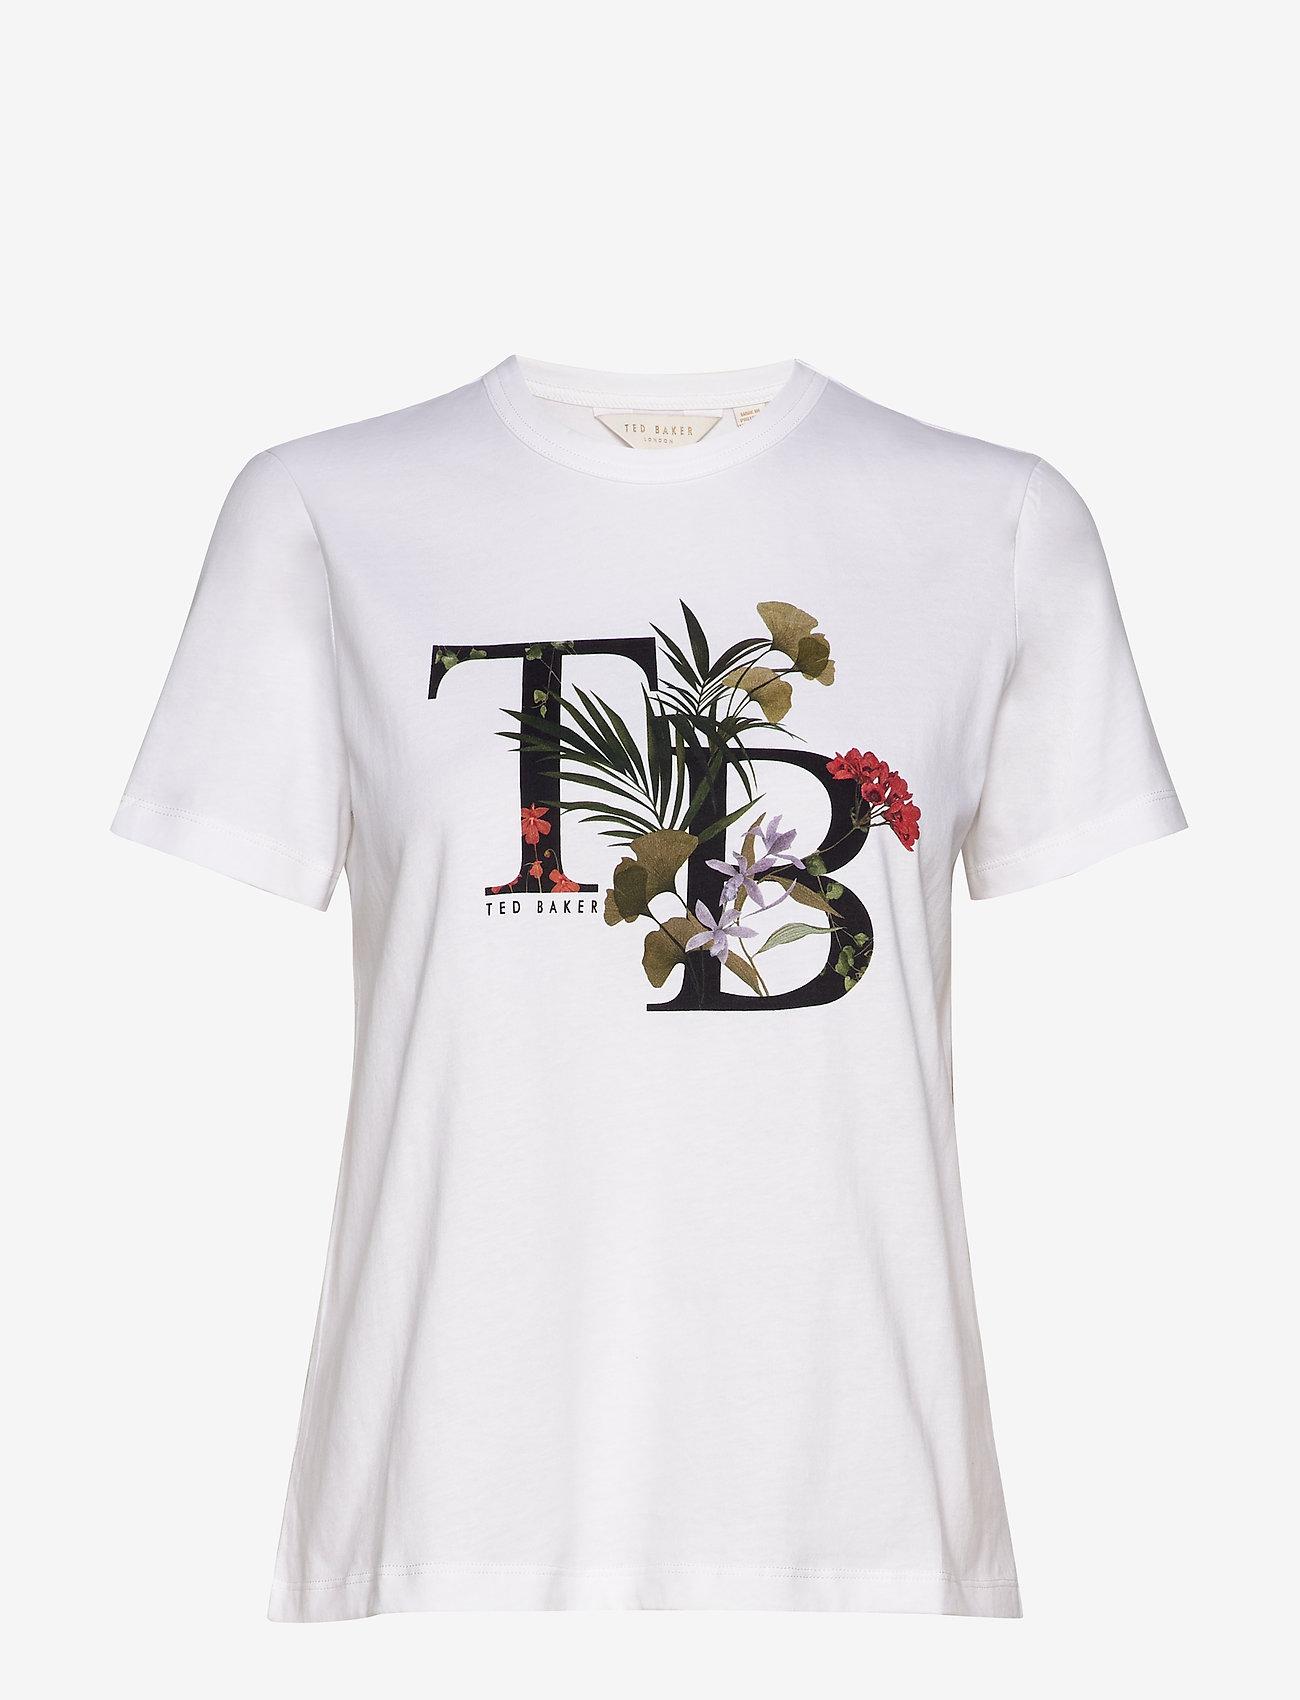 Ted Baker - AYMELIA - logo t-shirts - white